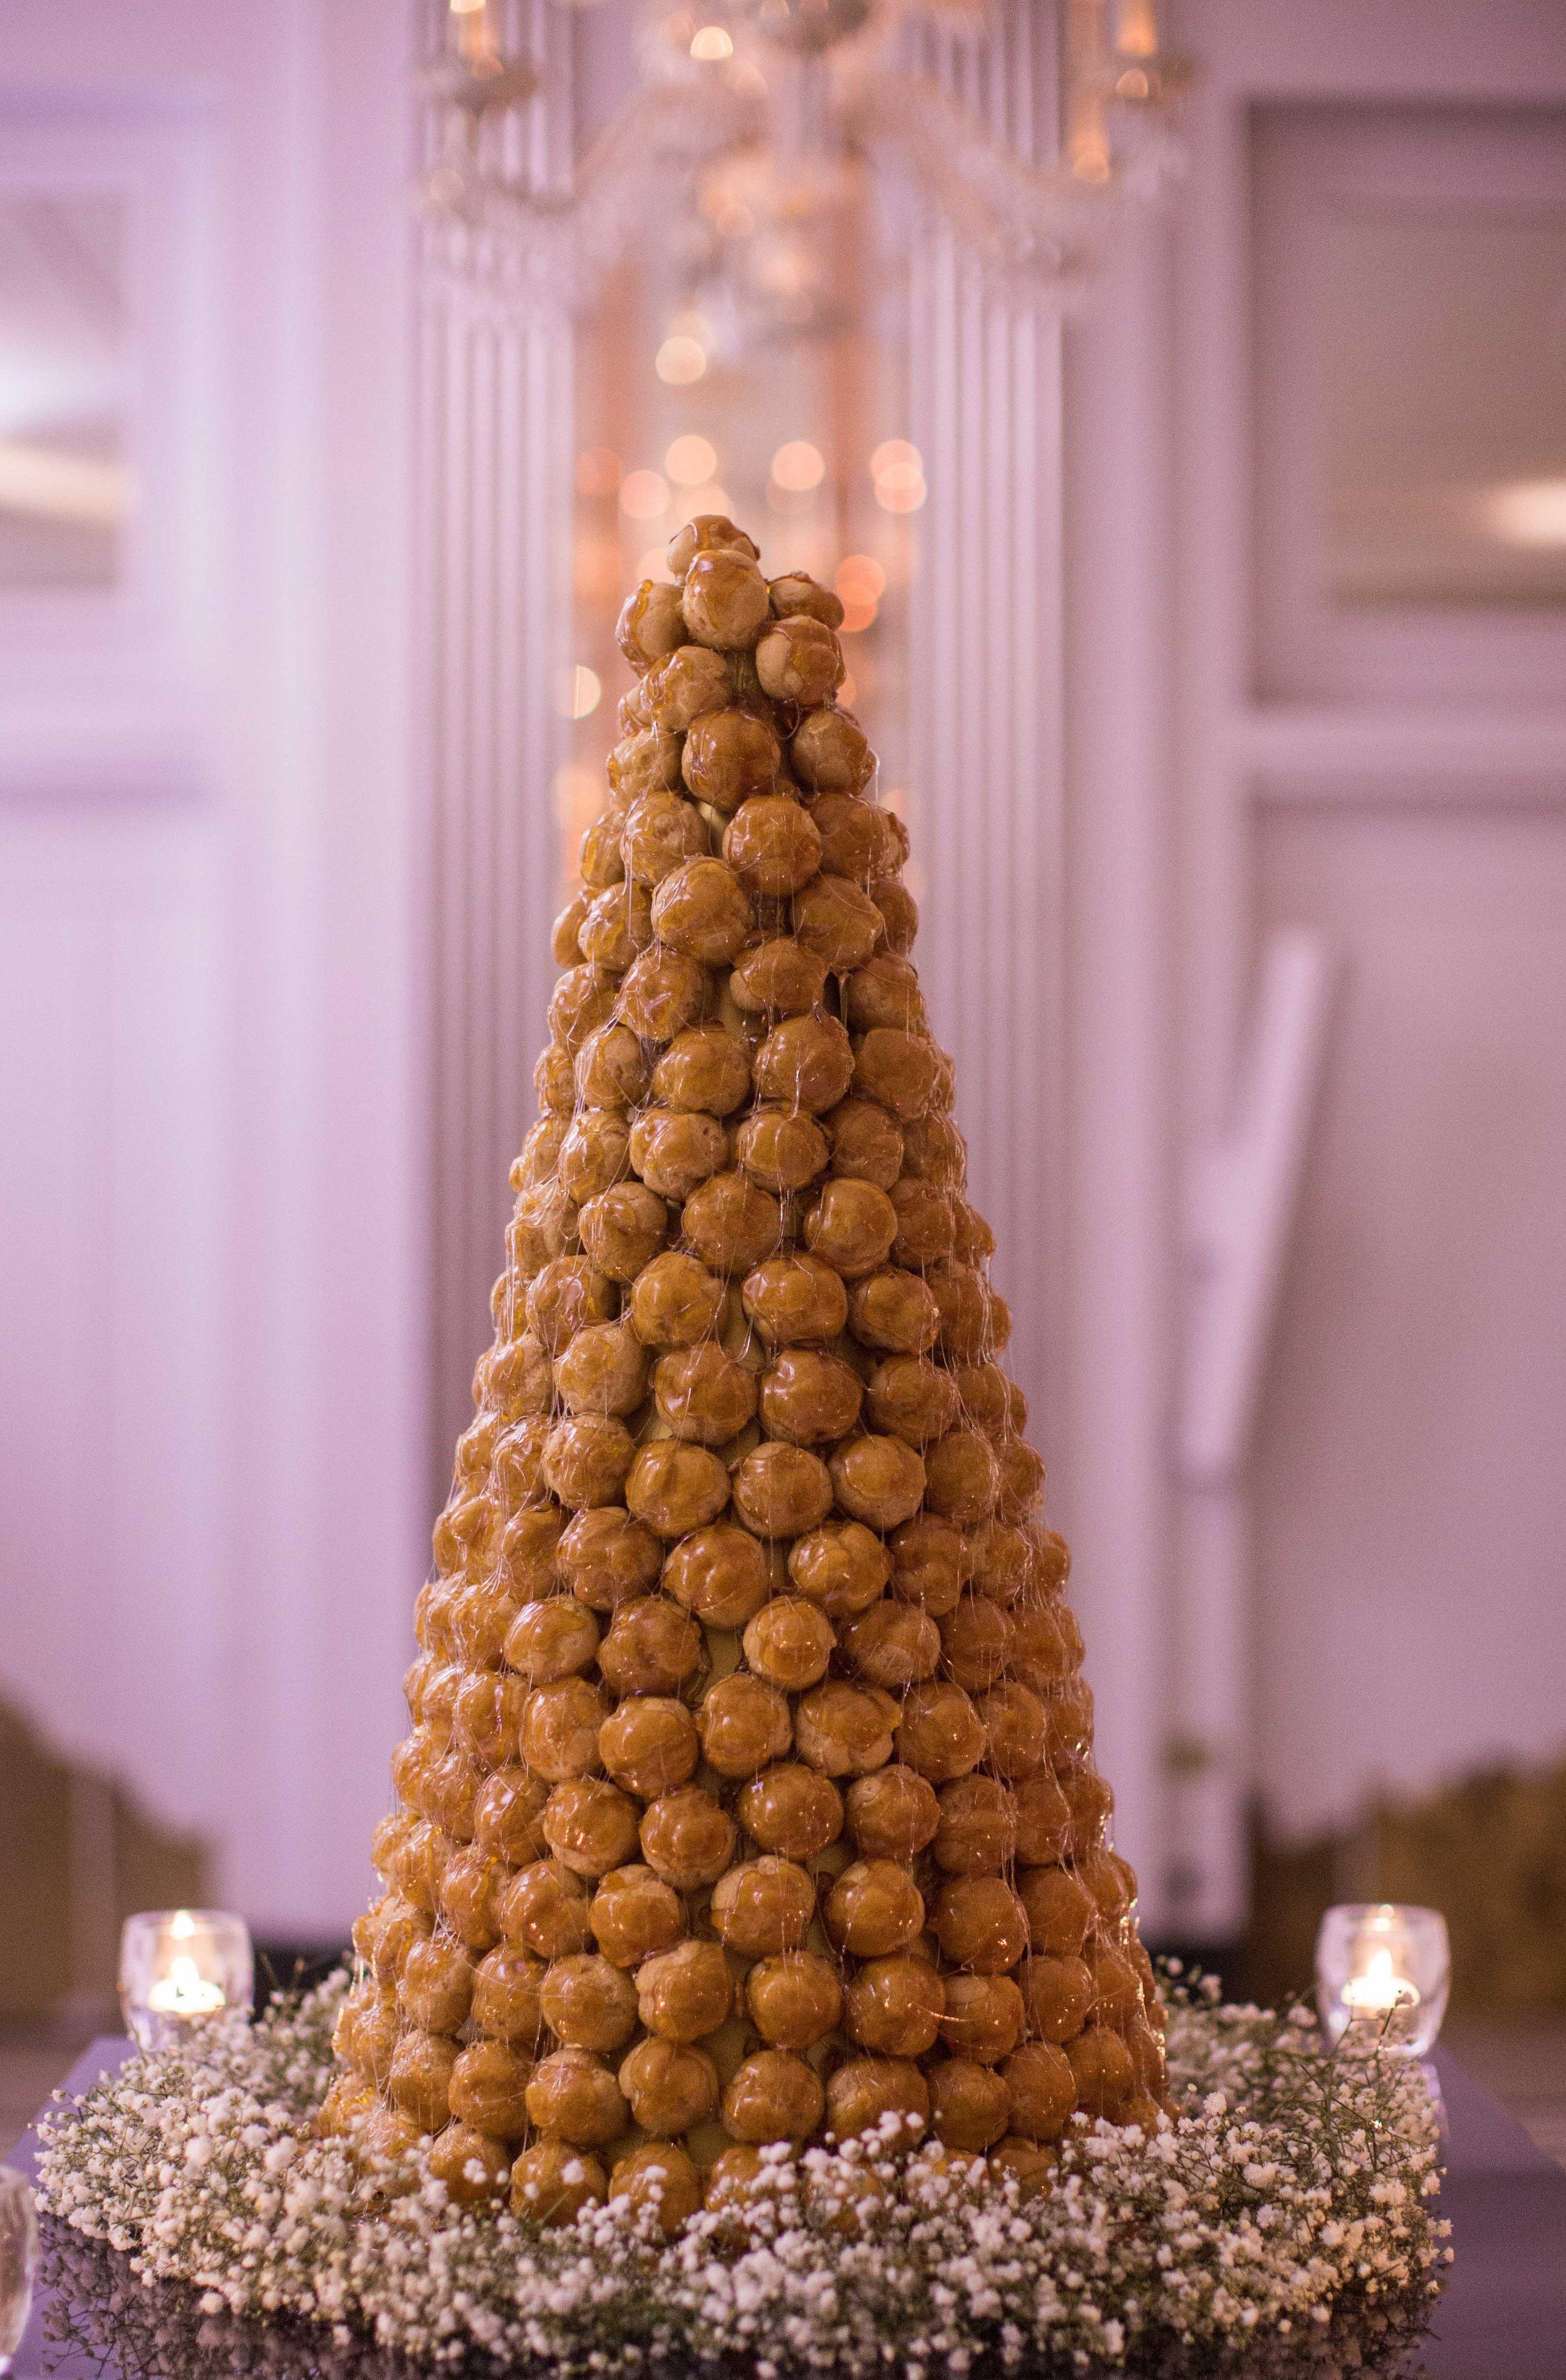 claridges-hotel-wedding-photographer-london-mayfair-natalia-smith-photography-109.jpg